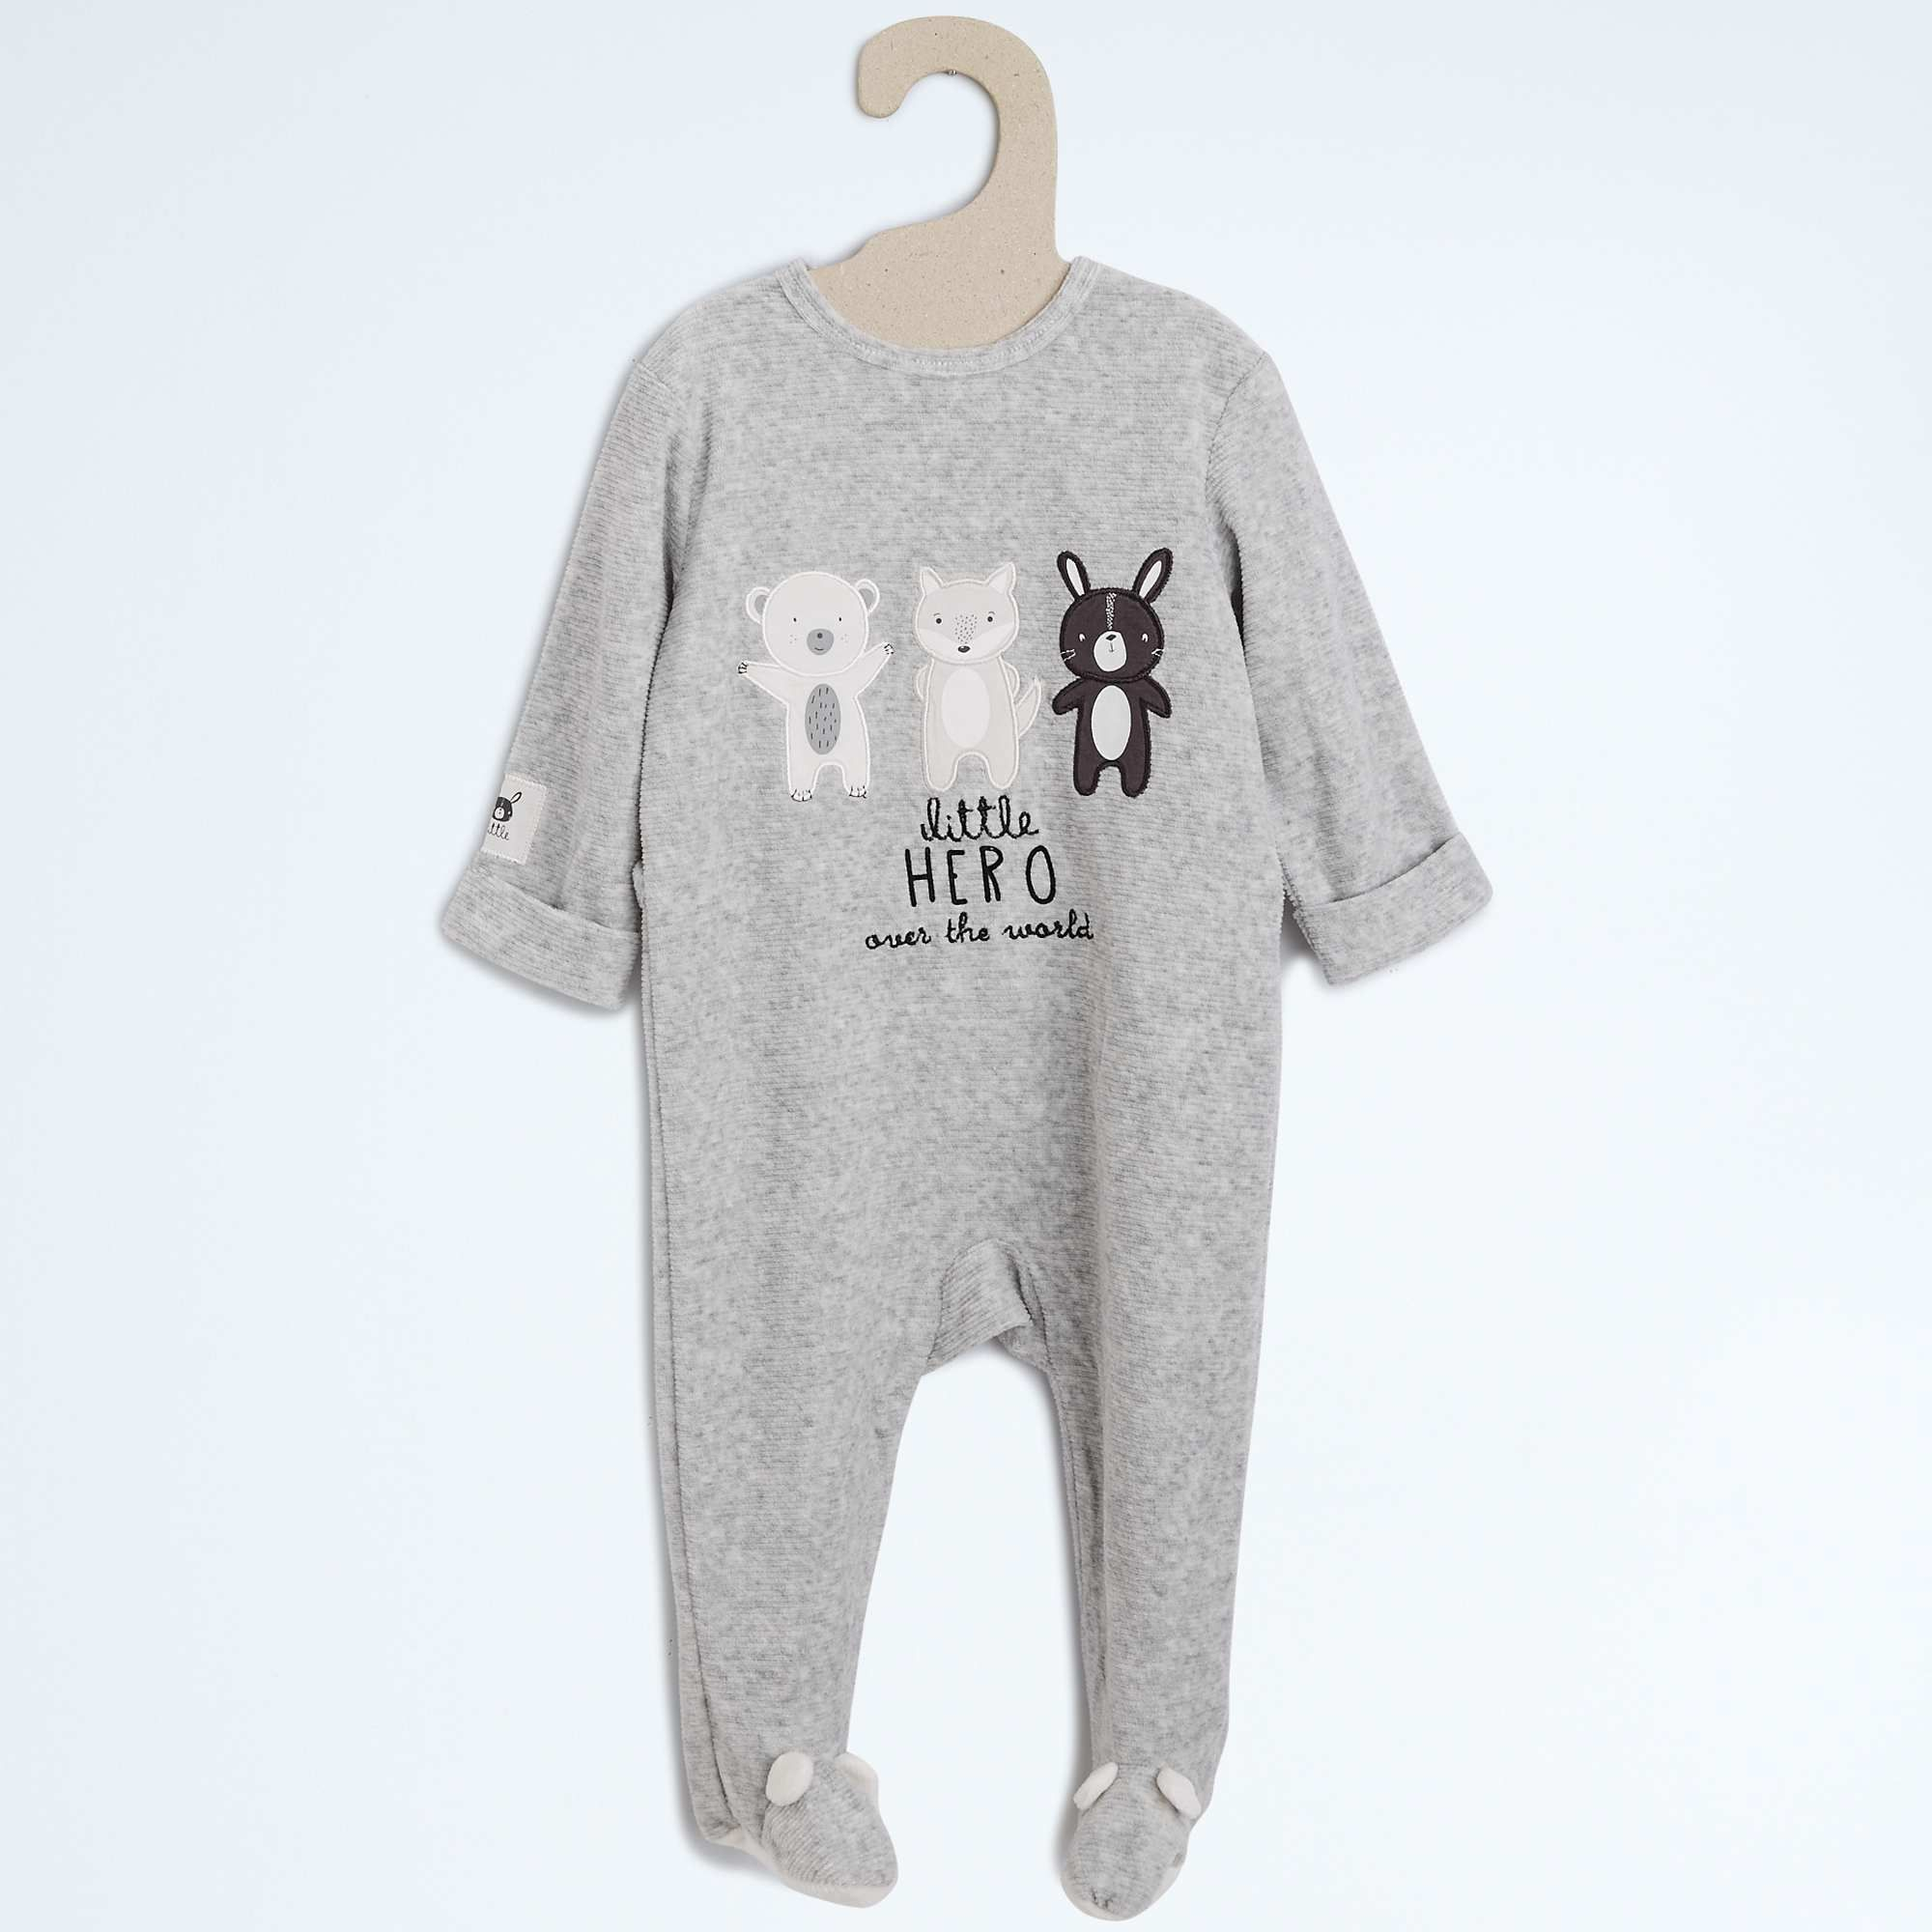 66775a369355b Pyjama velours texturé avec broderie Bébé garçon - Kiabi - 10